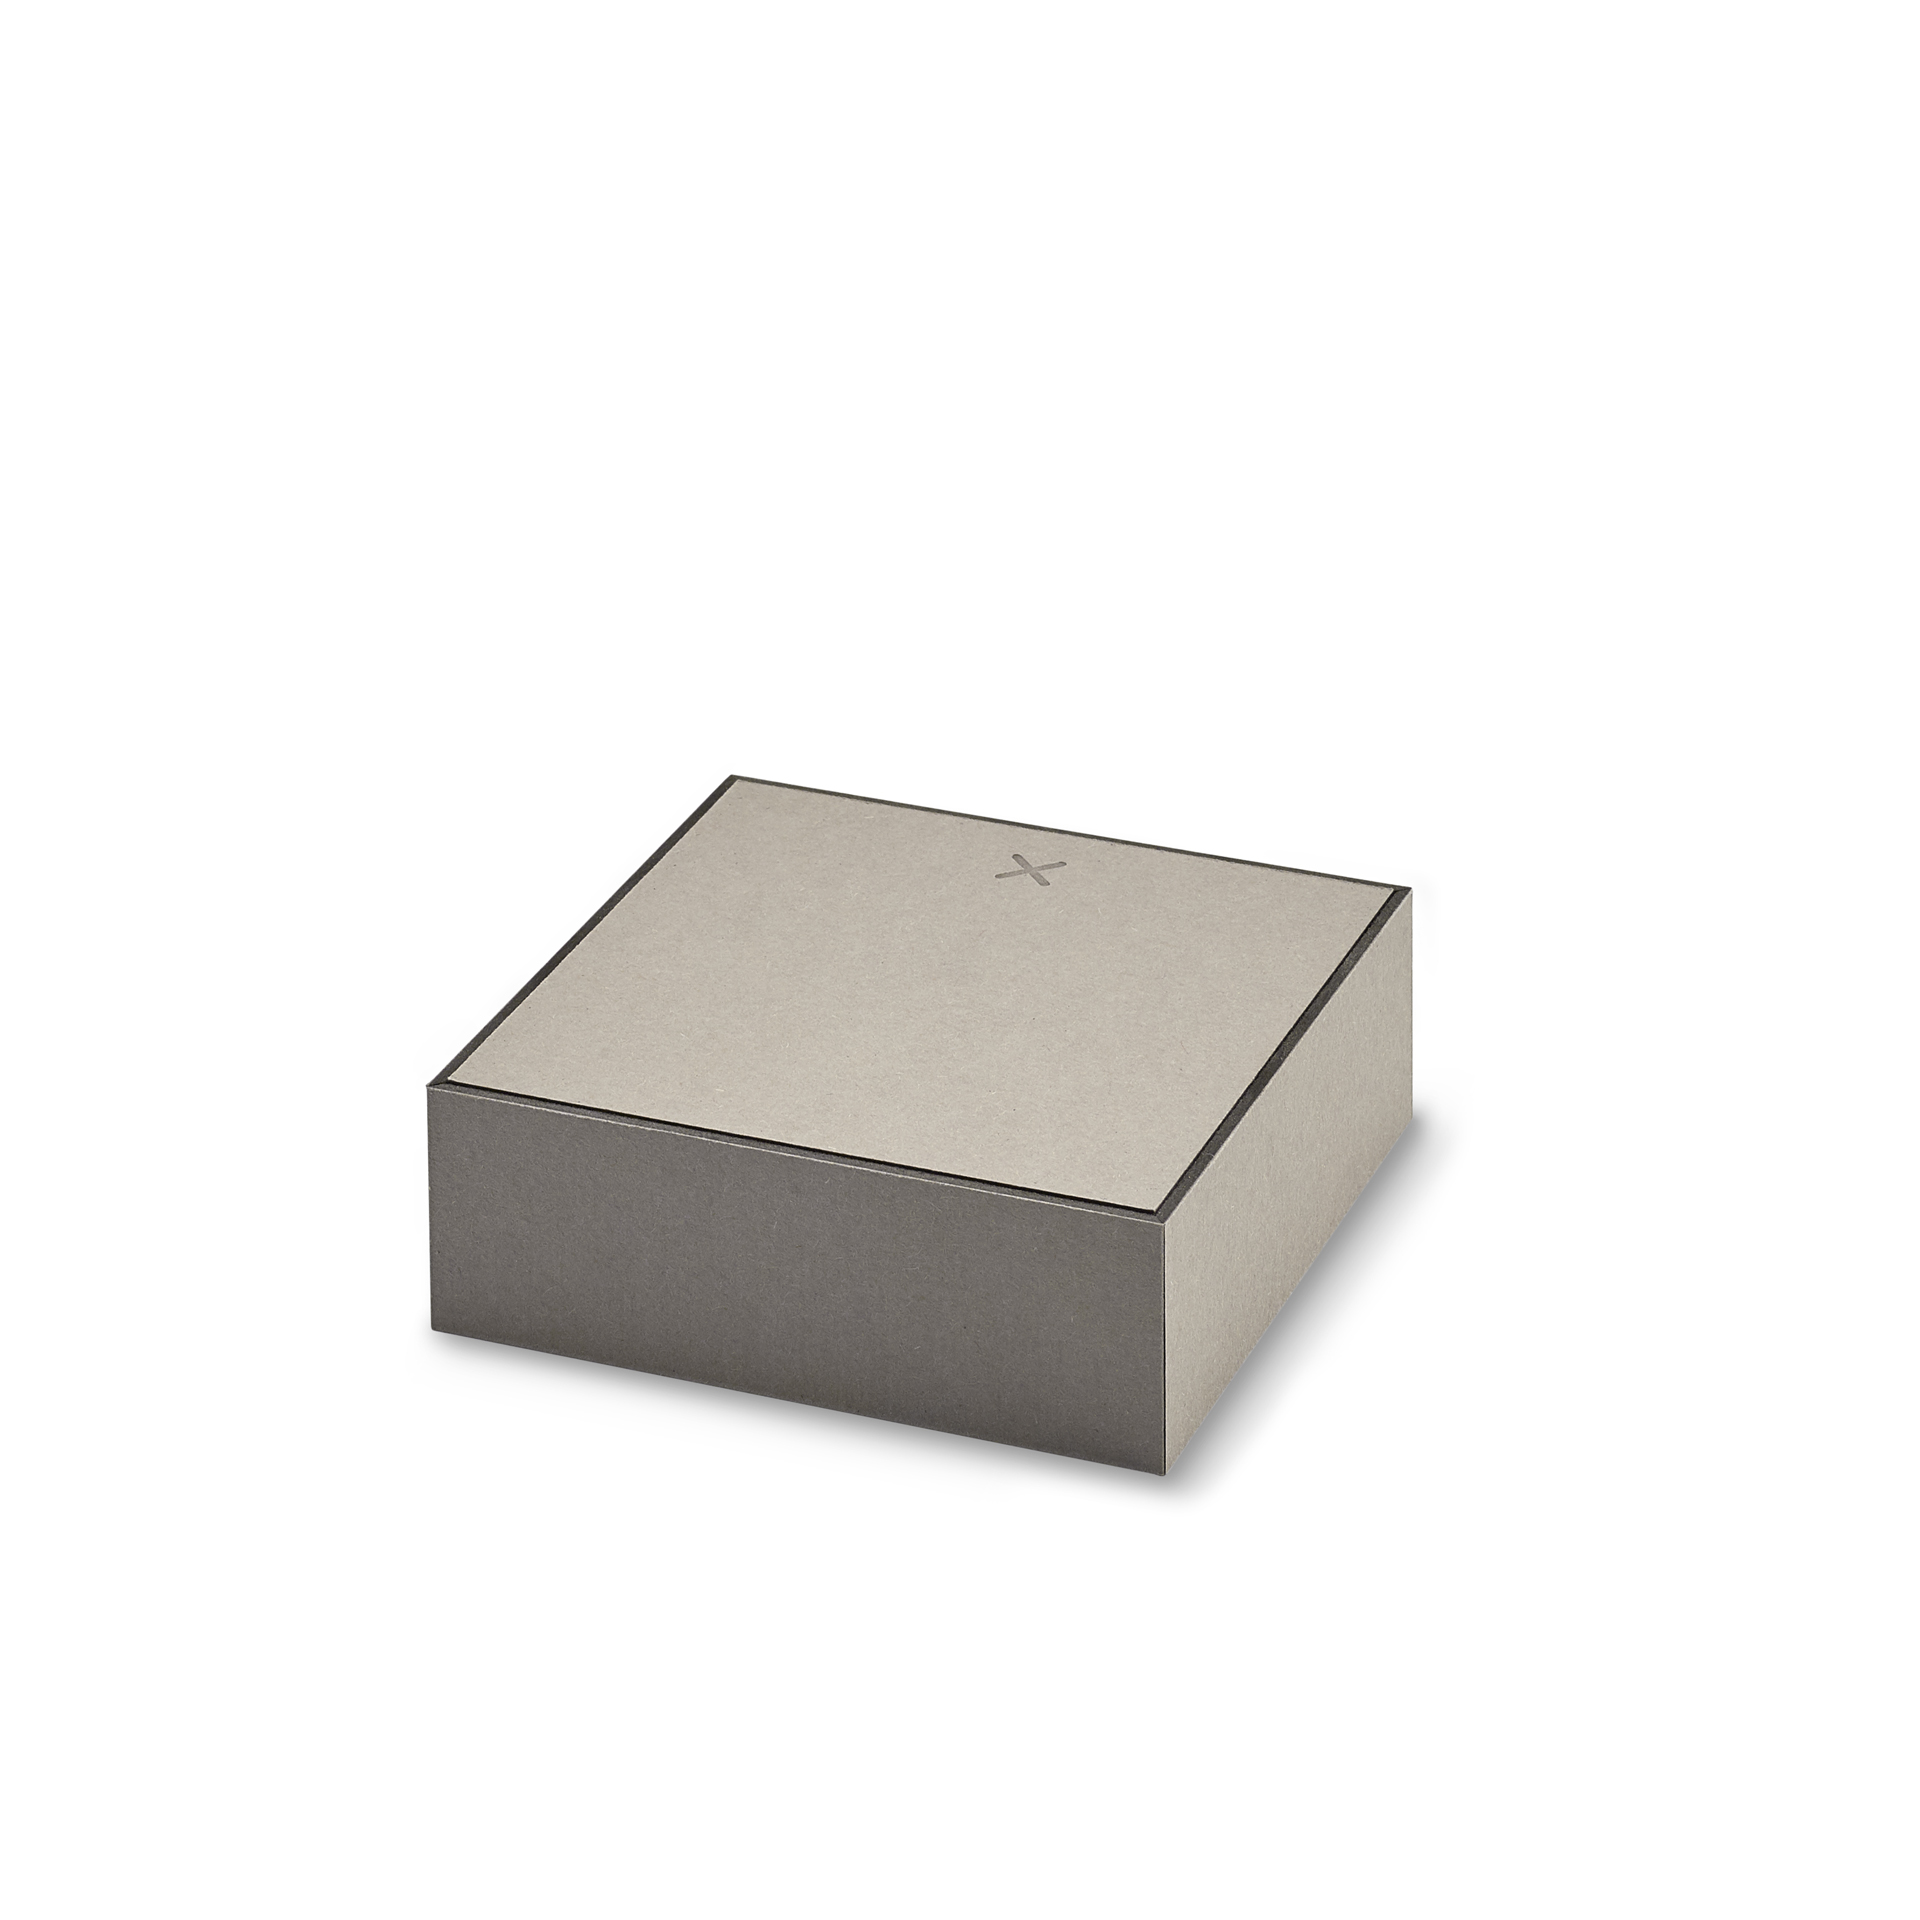 FLIPBOX universal grey